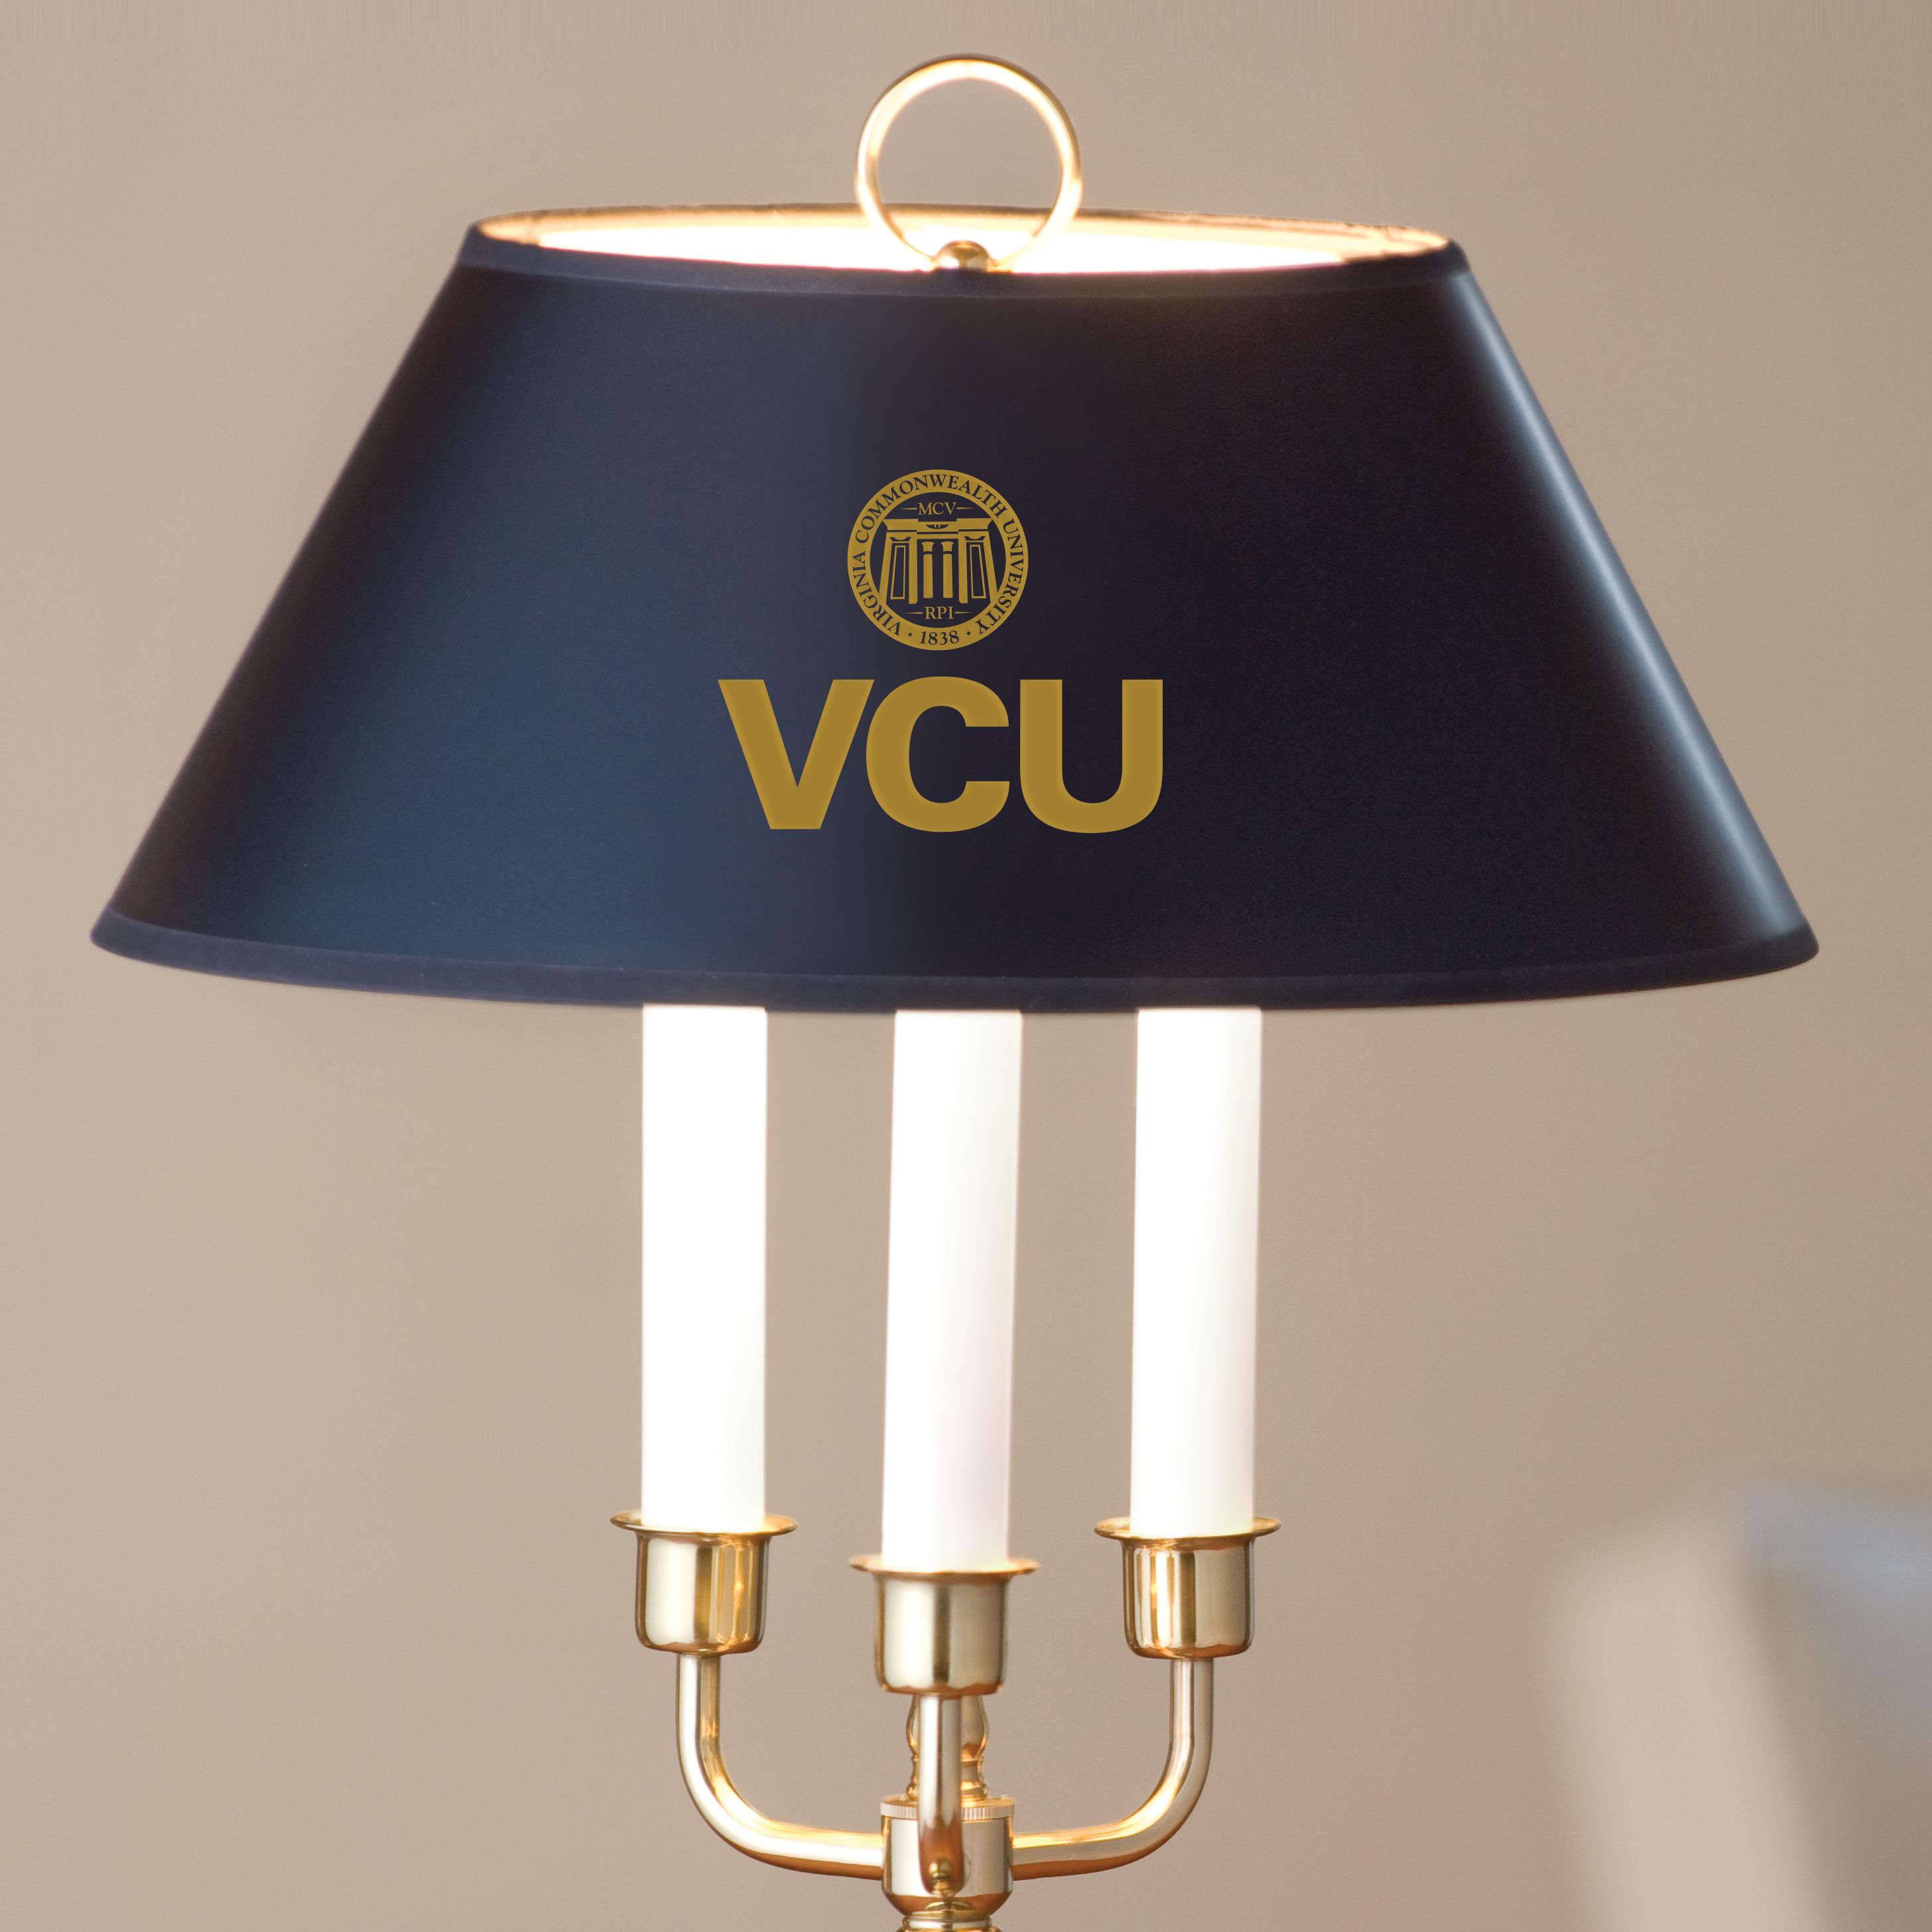 Virginia Commonwealth University Lamp in Brass & Marble - Image 2